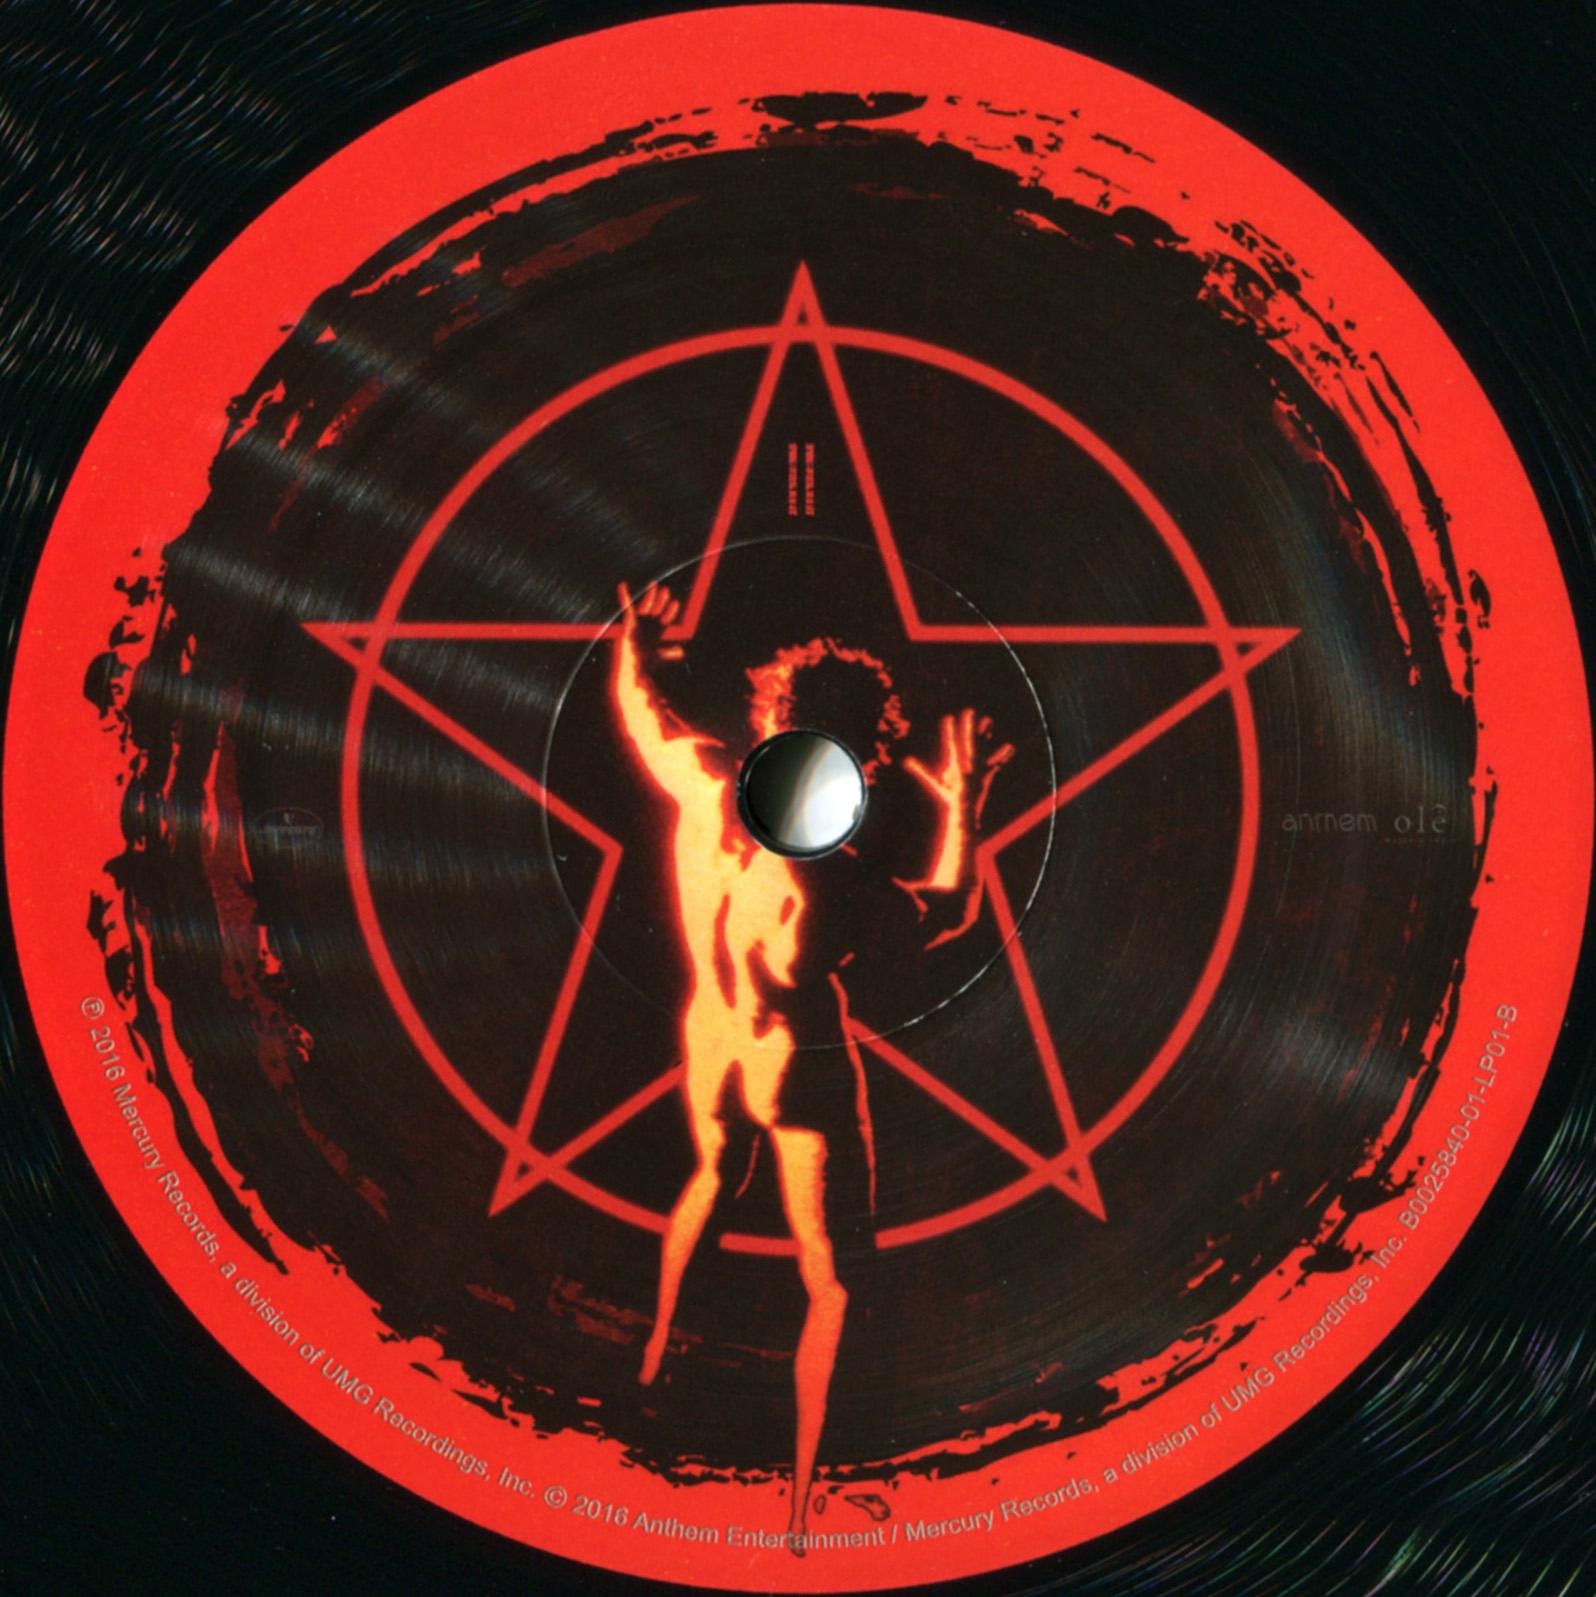 Rush 2112 40th Anniversary Deluxe Edition